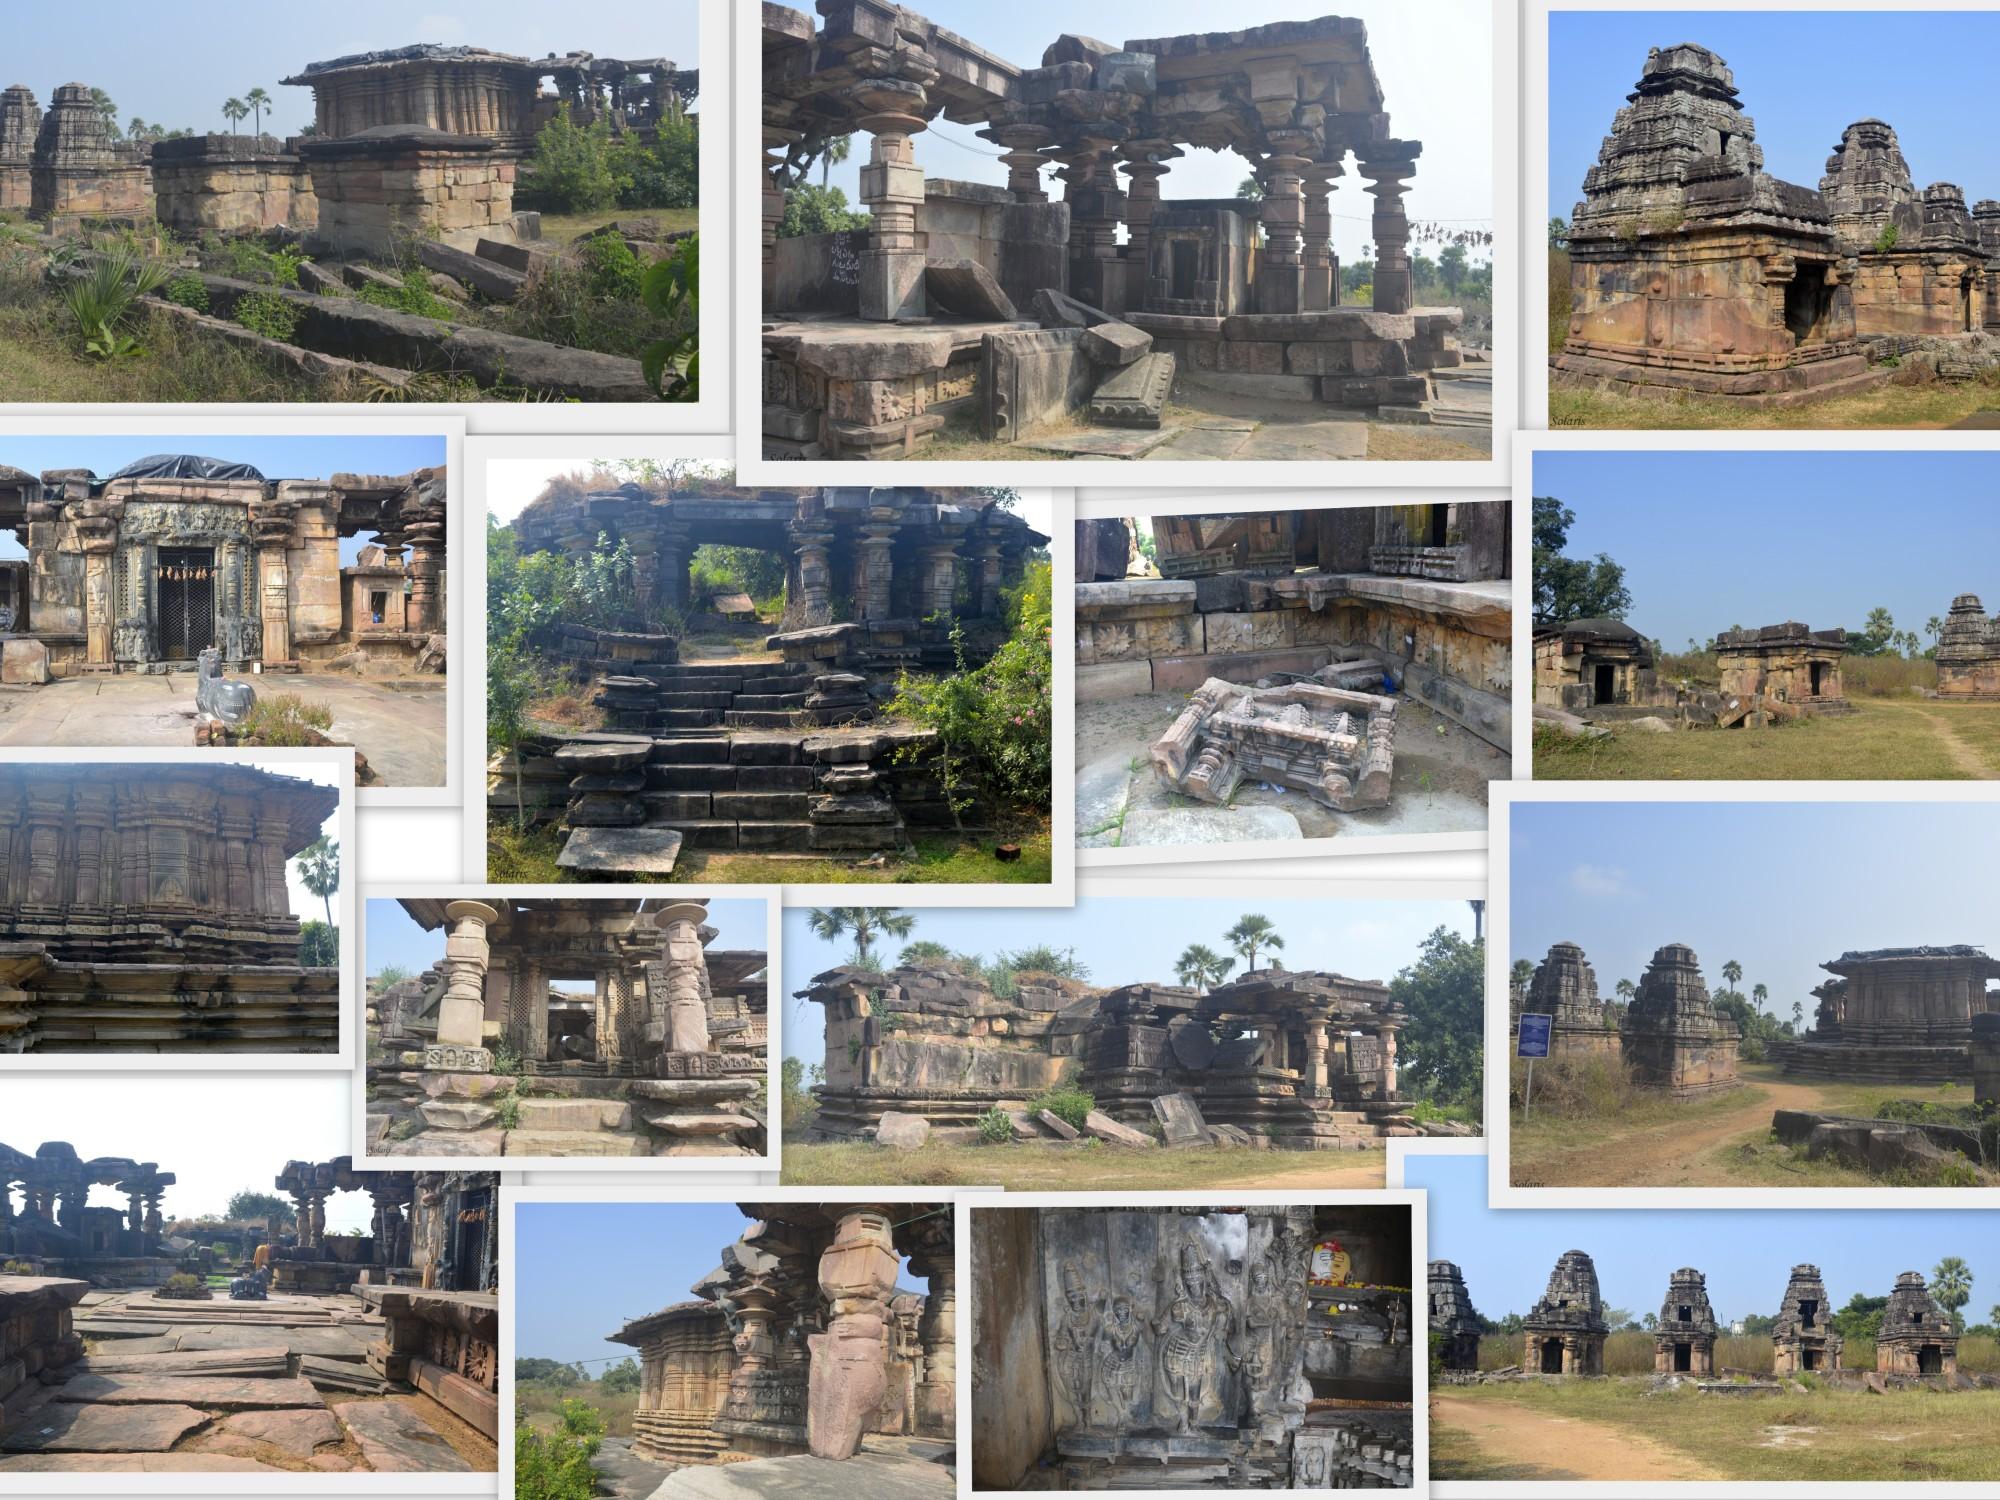 Ghanpur Group of Temples, Ghanpur